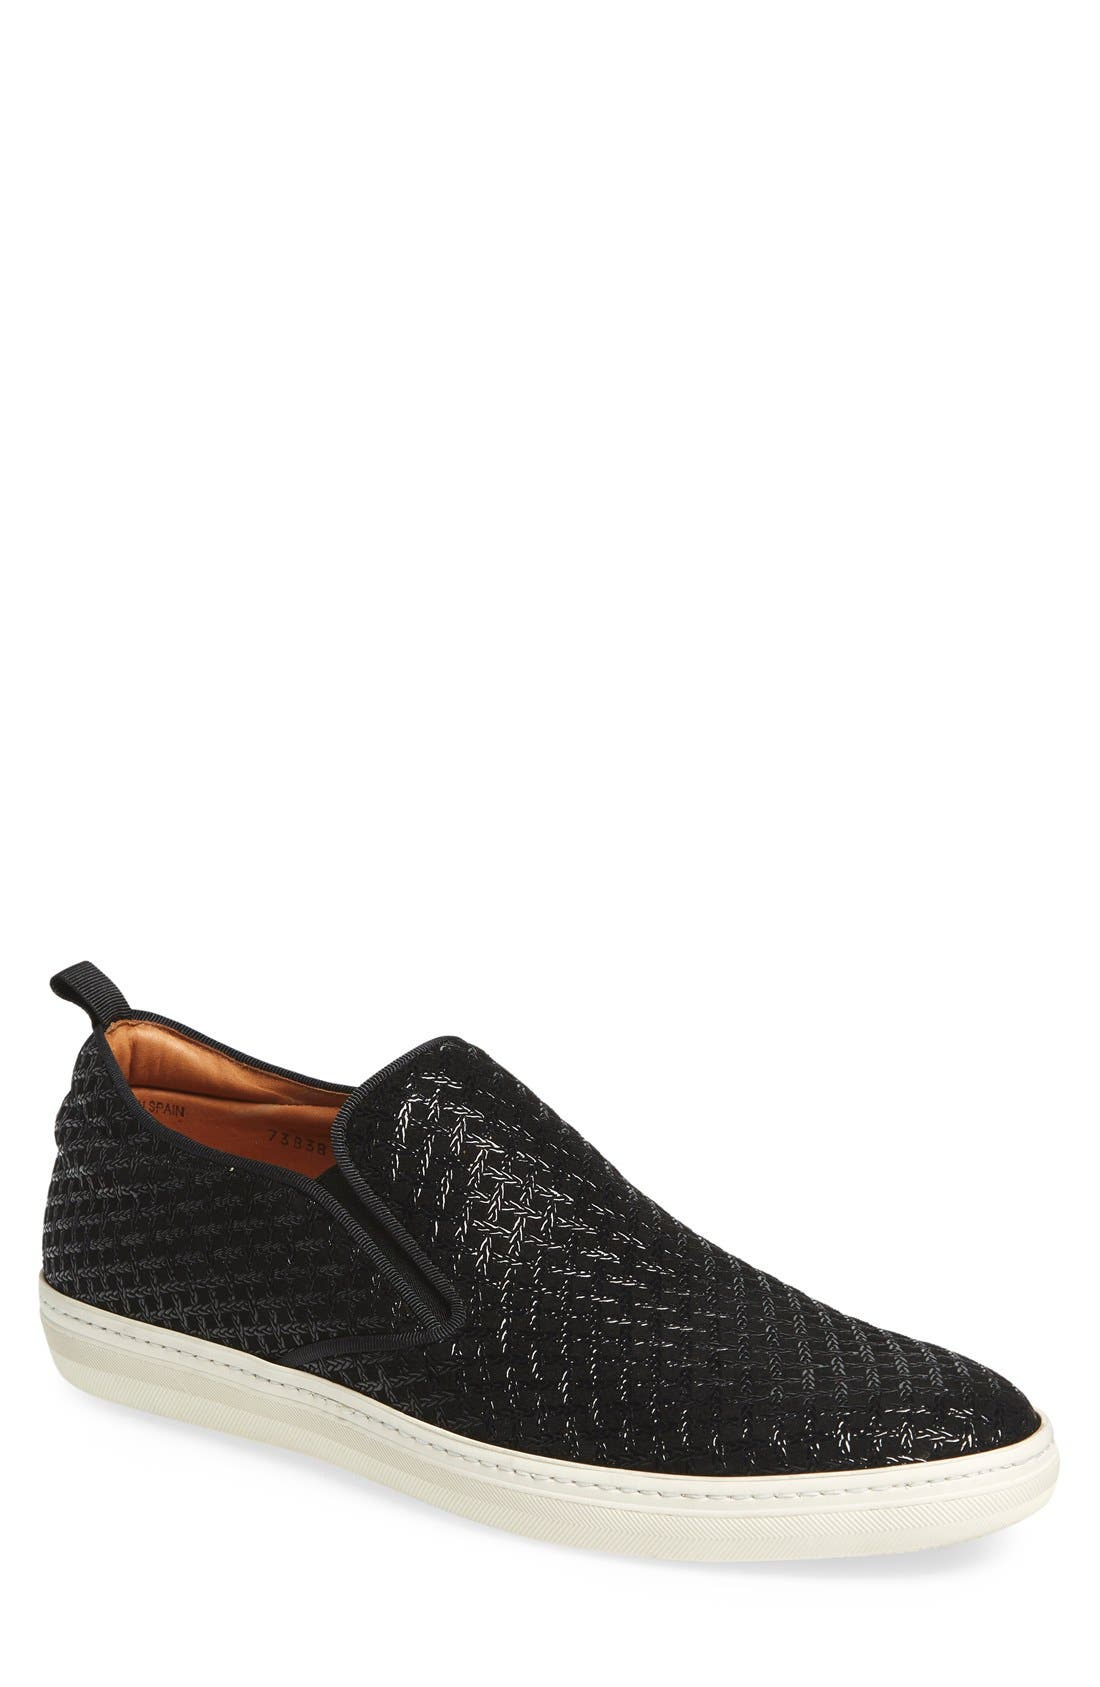 MEZLAN 'Moneo II' Slip-On Sneaker